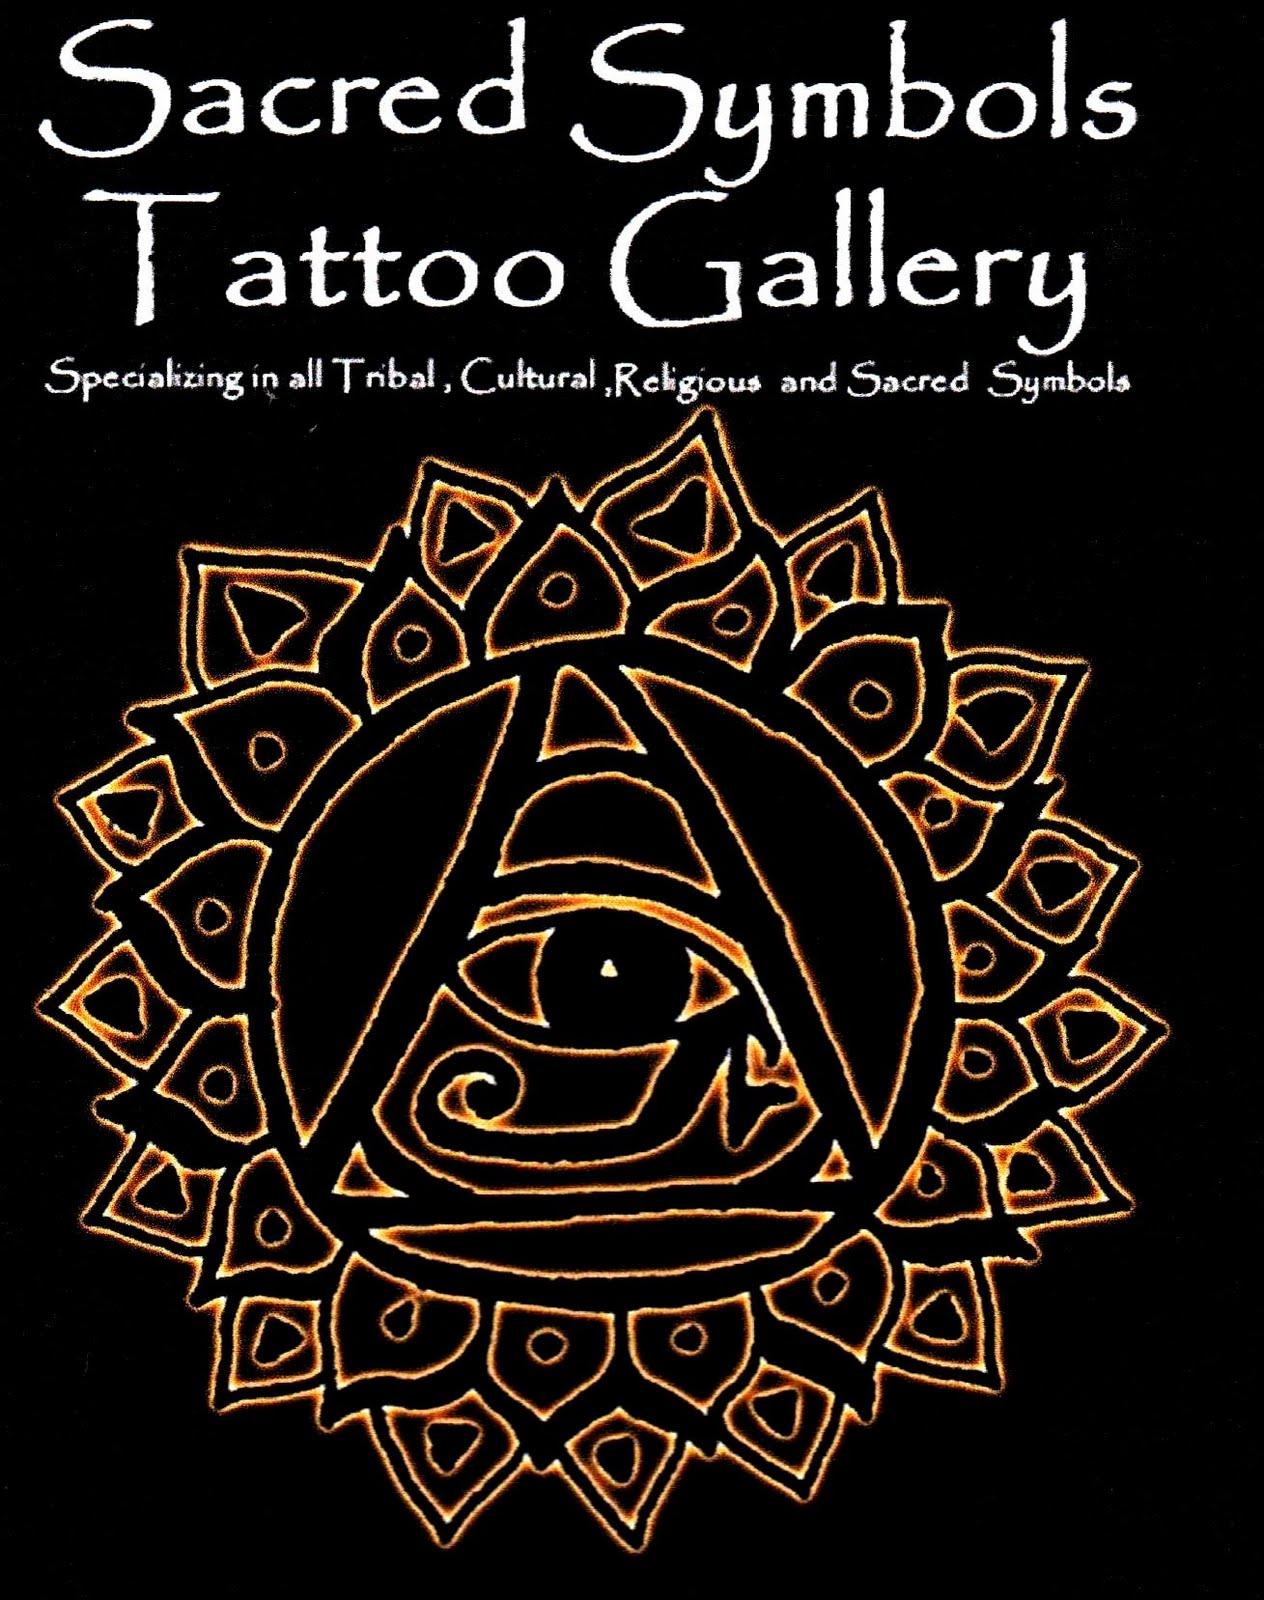 sacred symbols Sacred symbols tattoo, chippenham, united kingdom 1,199 likes 2 talking about this 539 were here sacred symbols tattoo studio.